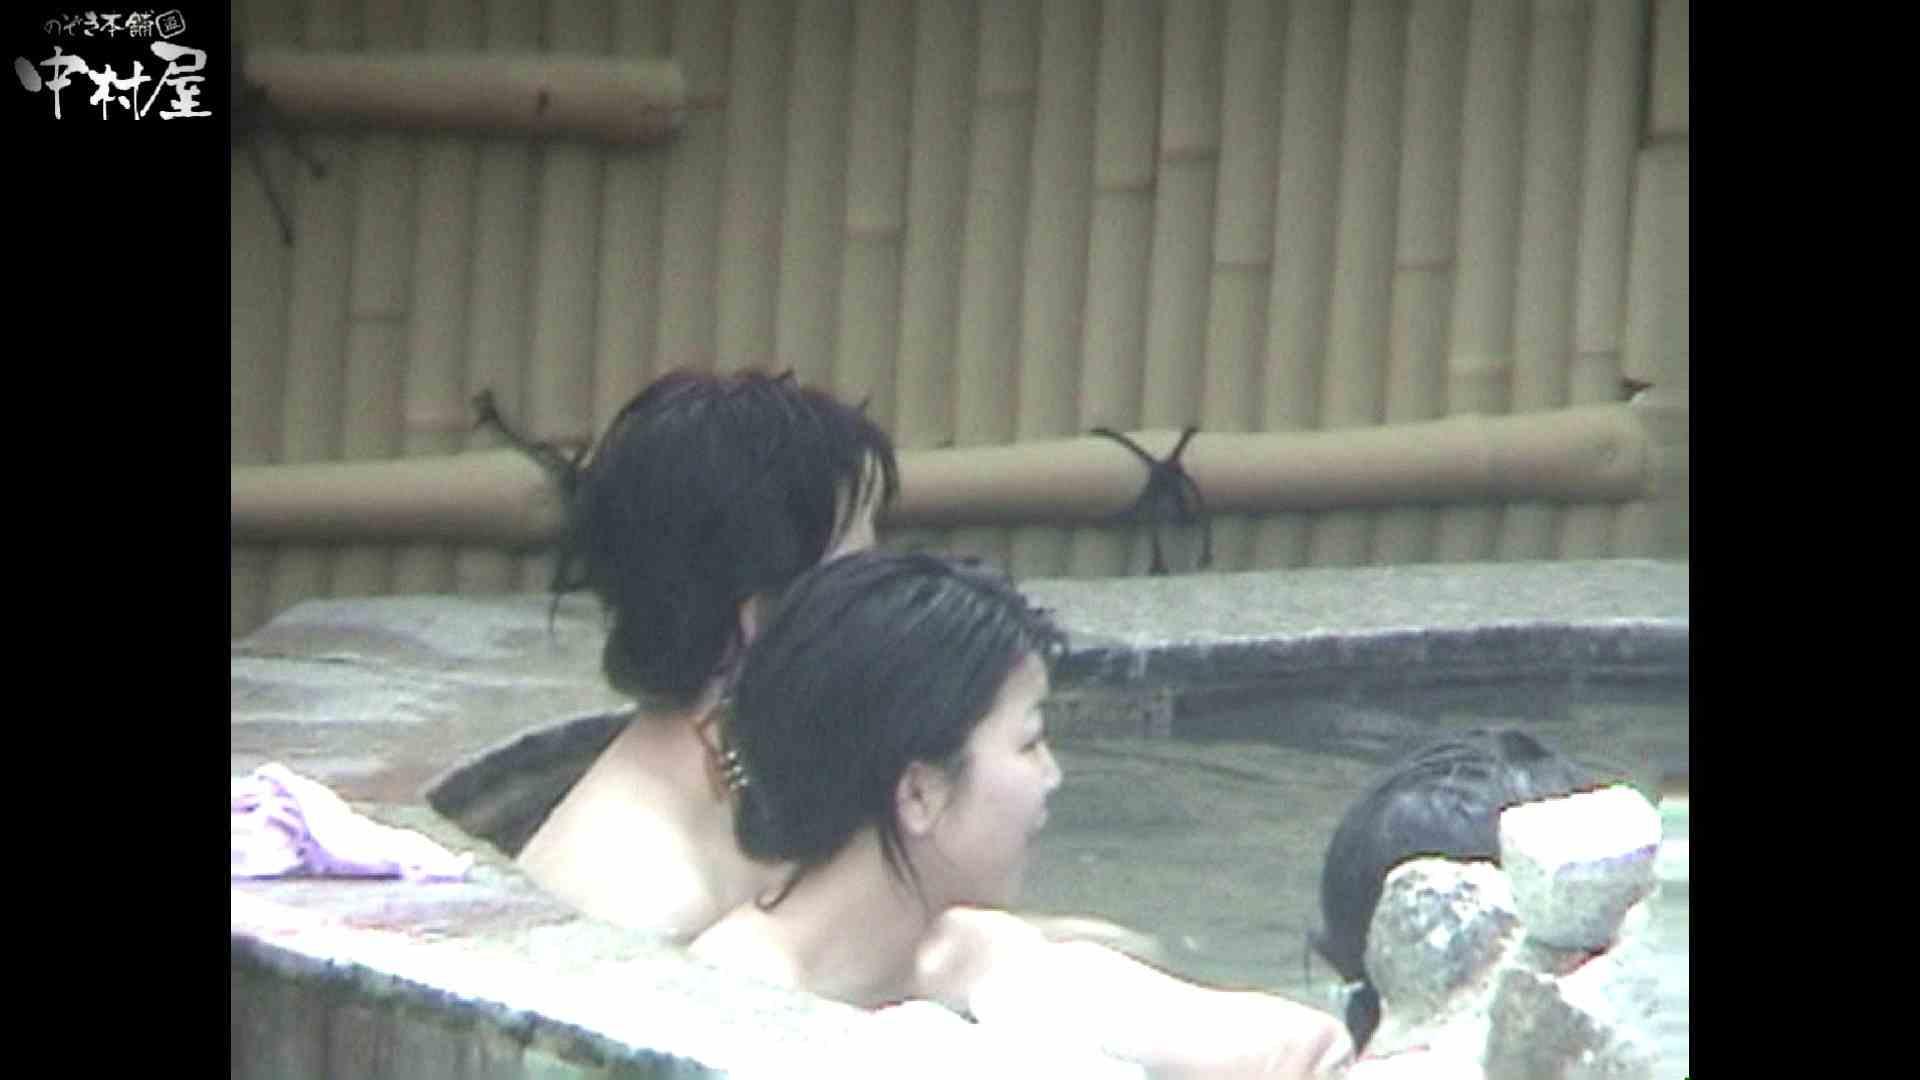 Aquaな露天風呂Vol.936 盗撮シリーズ | 露天風呂編  90PIX 37